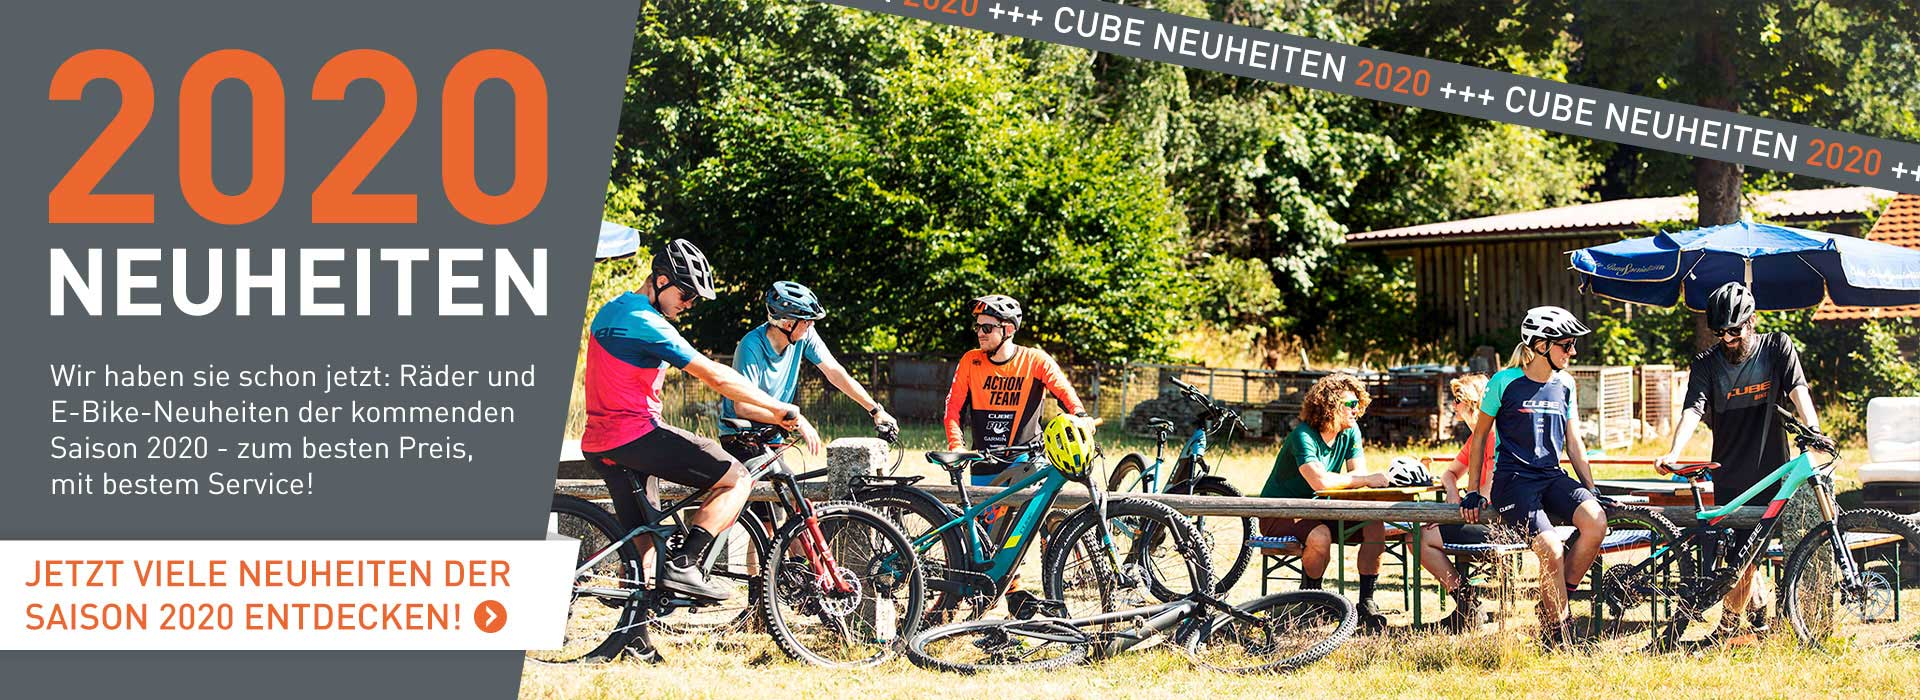 Cube Neuheiten Bikes